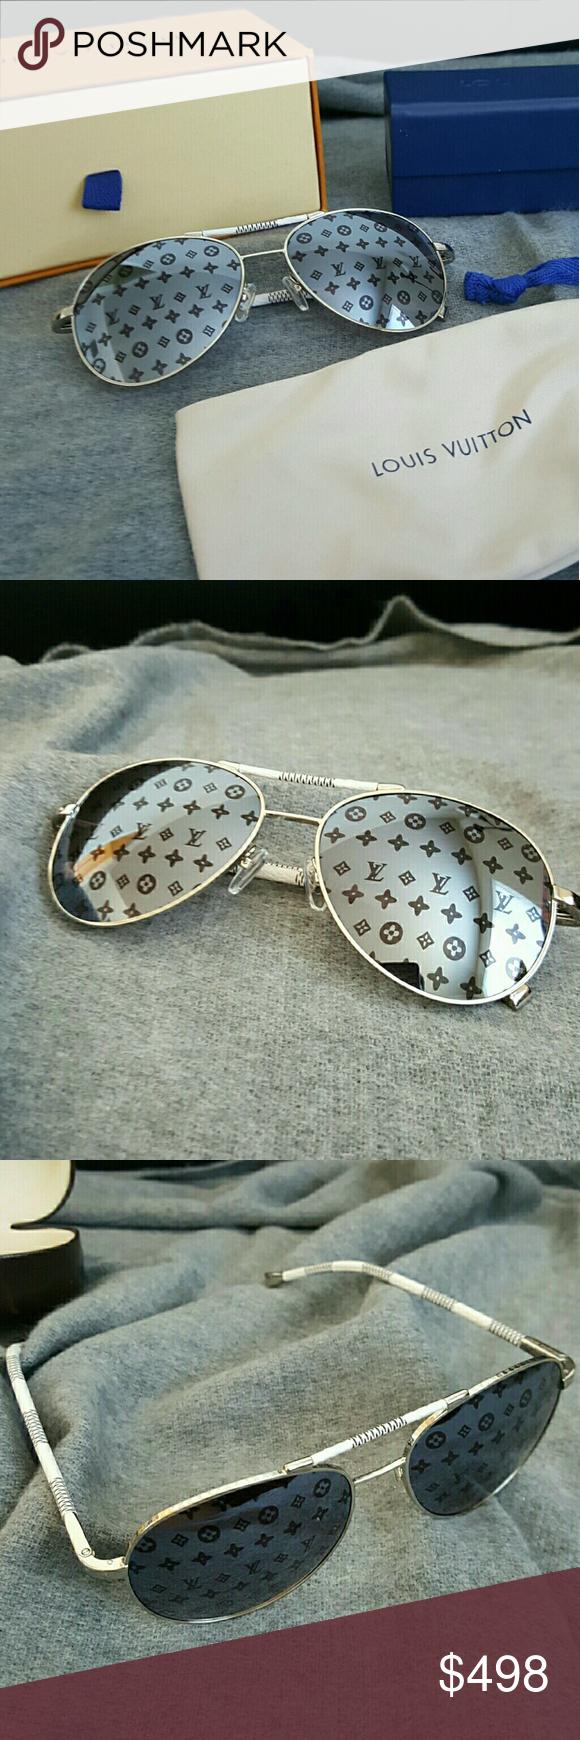 0d3e57489c Authentic Louis Vuitton Monogram Sunglasses Unisex Made in Italy For men or  women Lens color